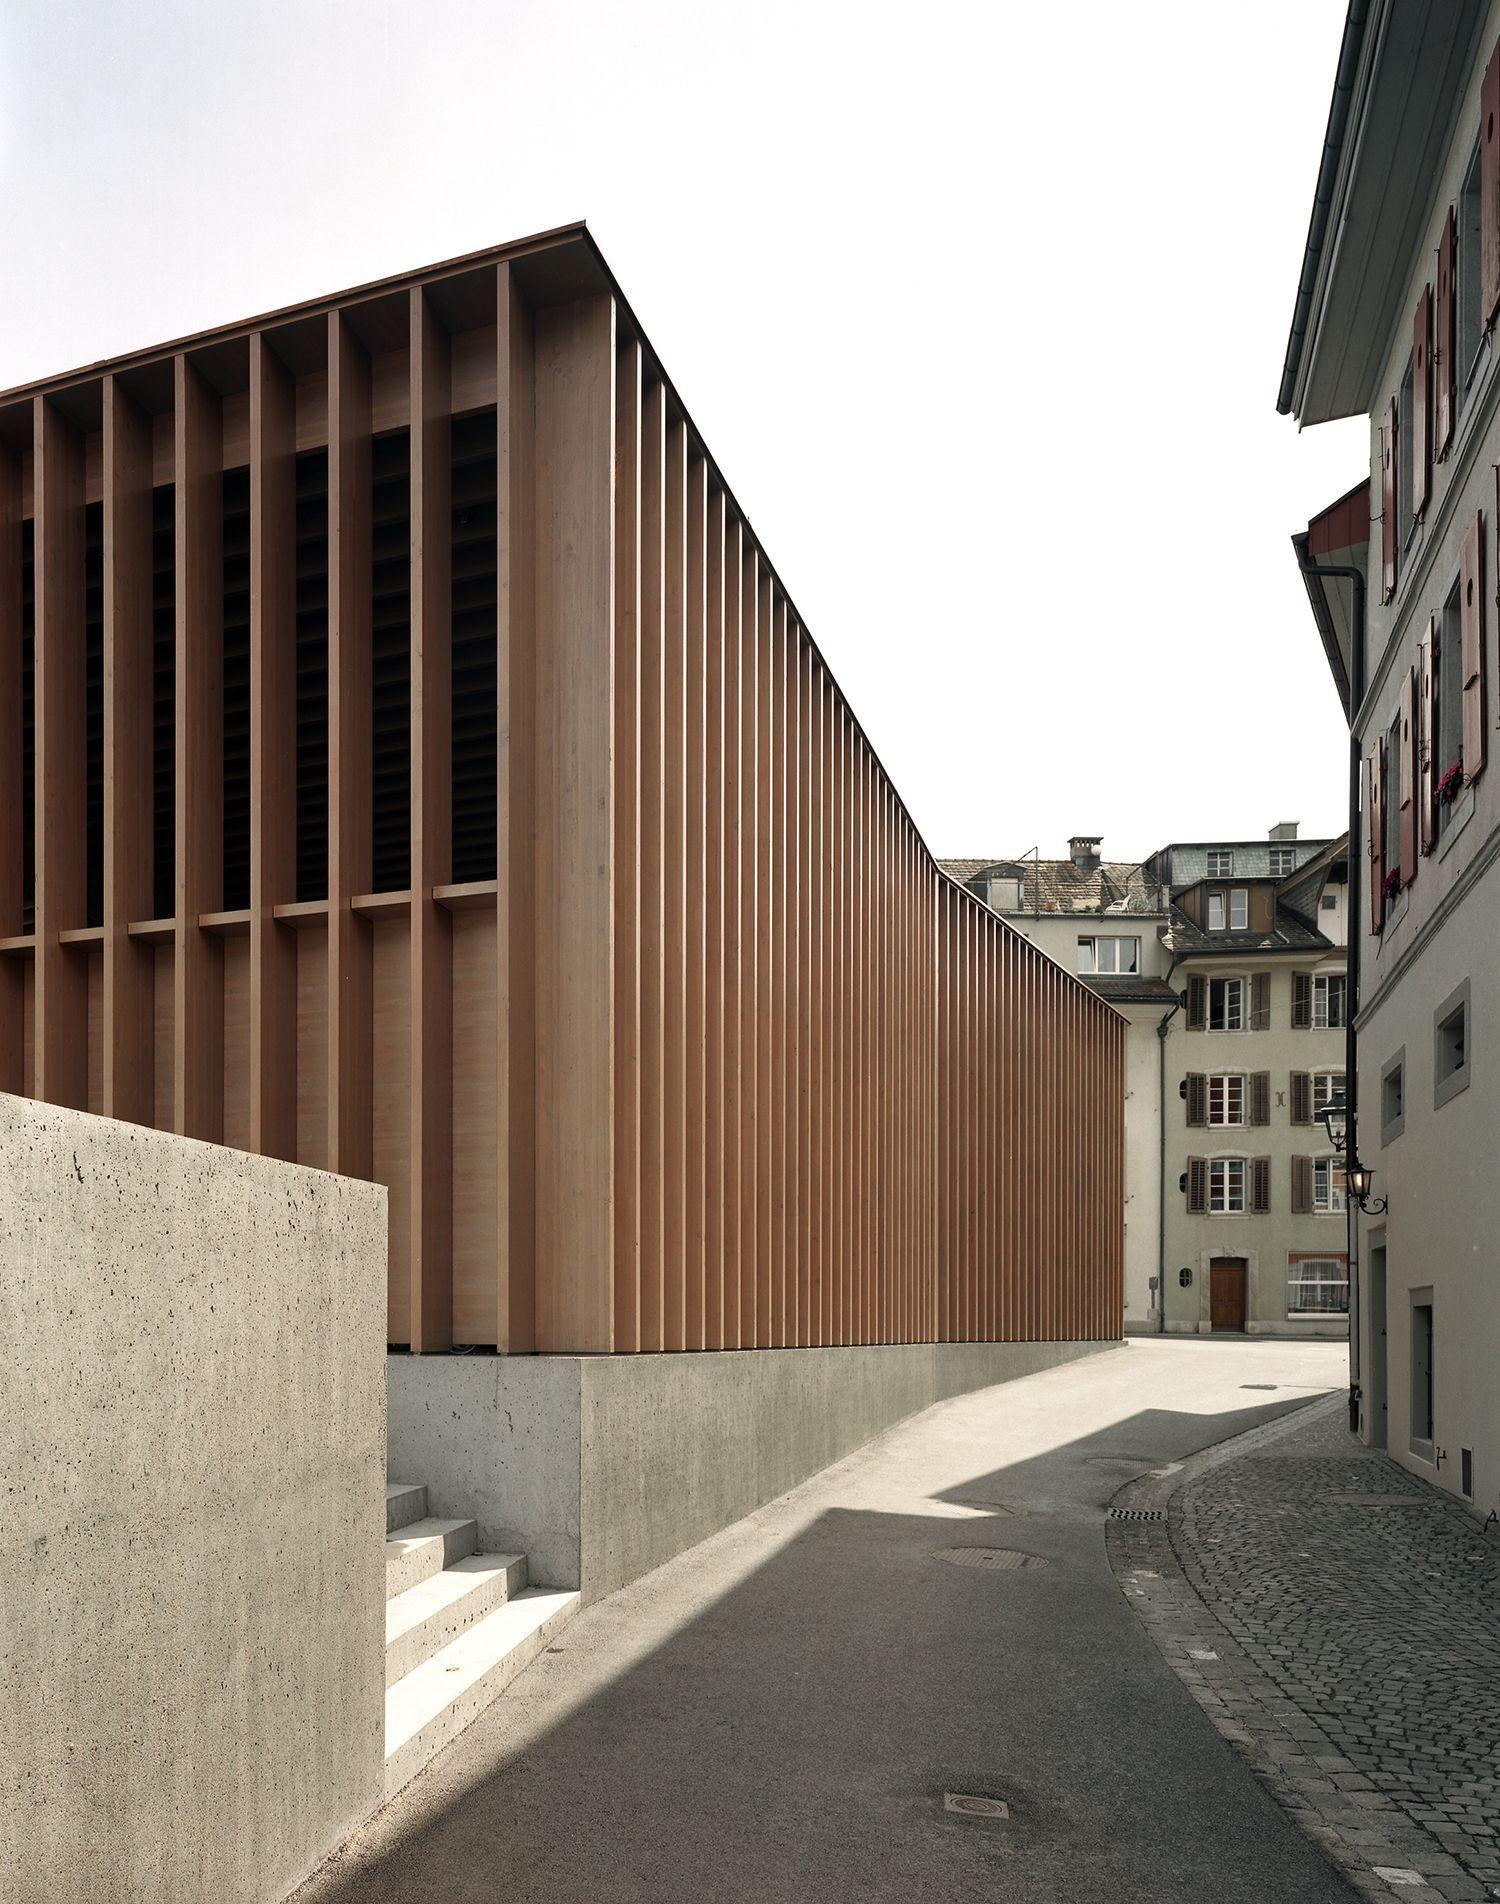 Miller Maranta Architecture Timber Architecture Building Design